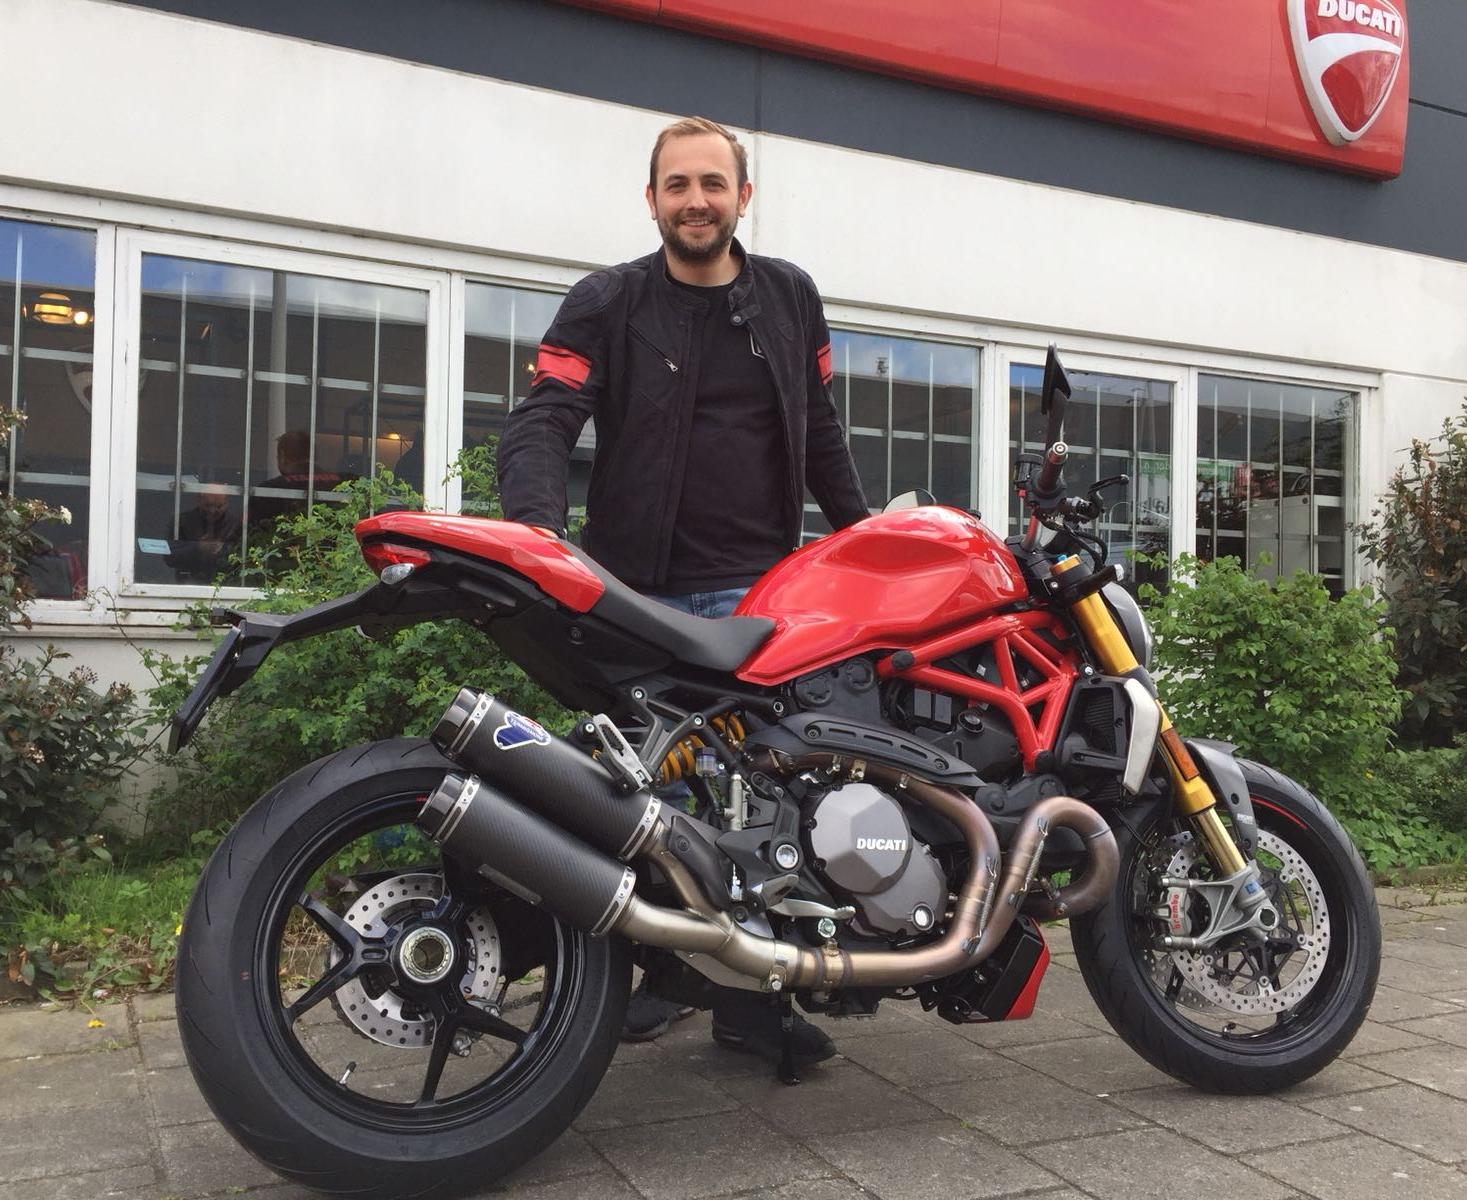 ducati dealer motortoer in amsterdam verkoopt nieuwe ducatis monster 1200